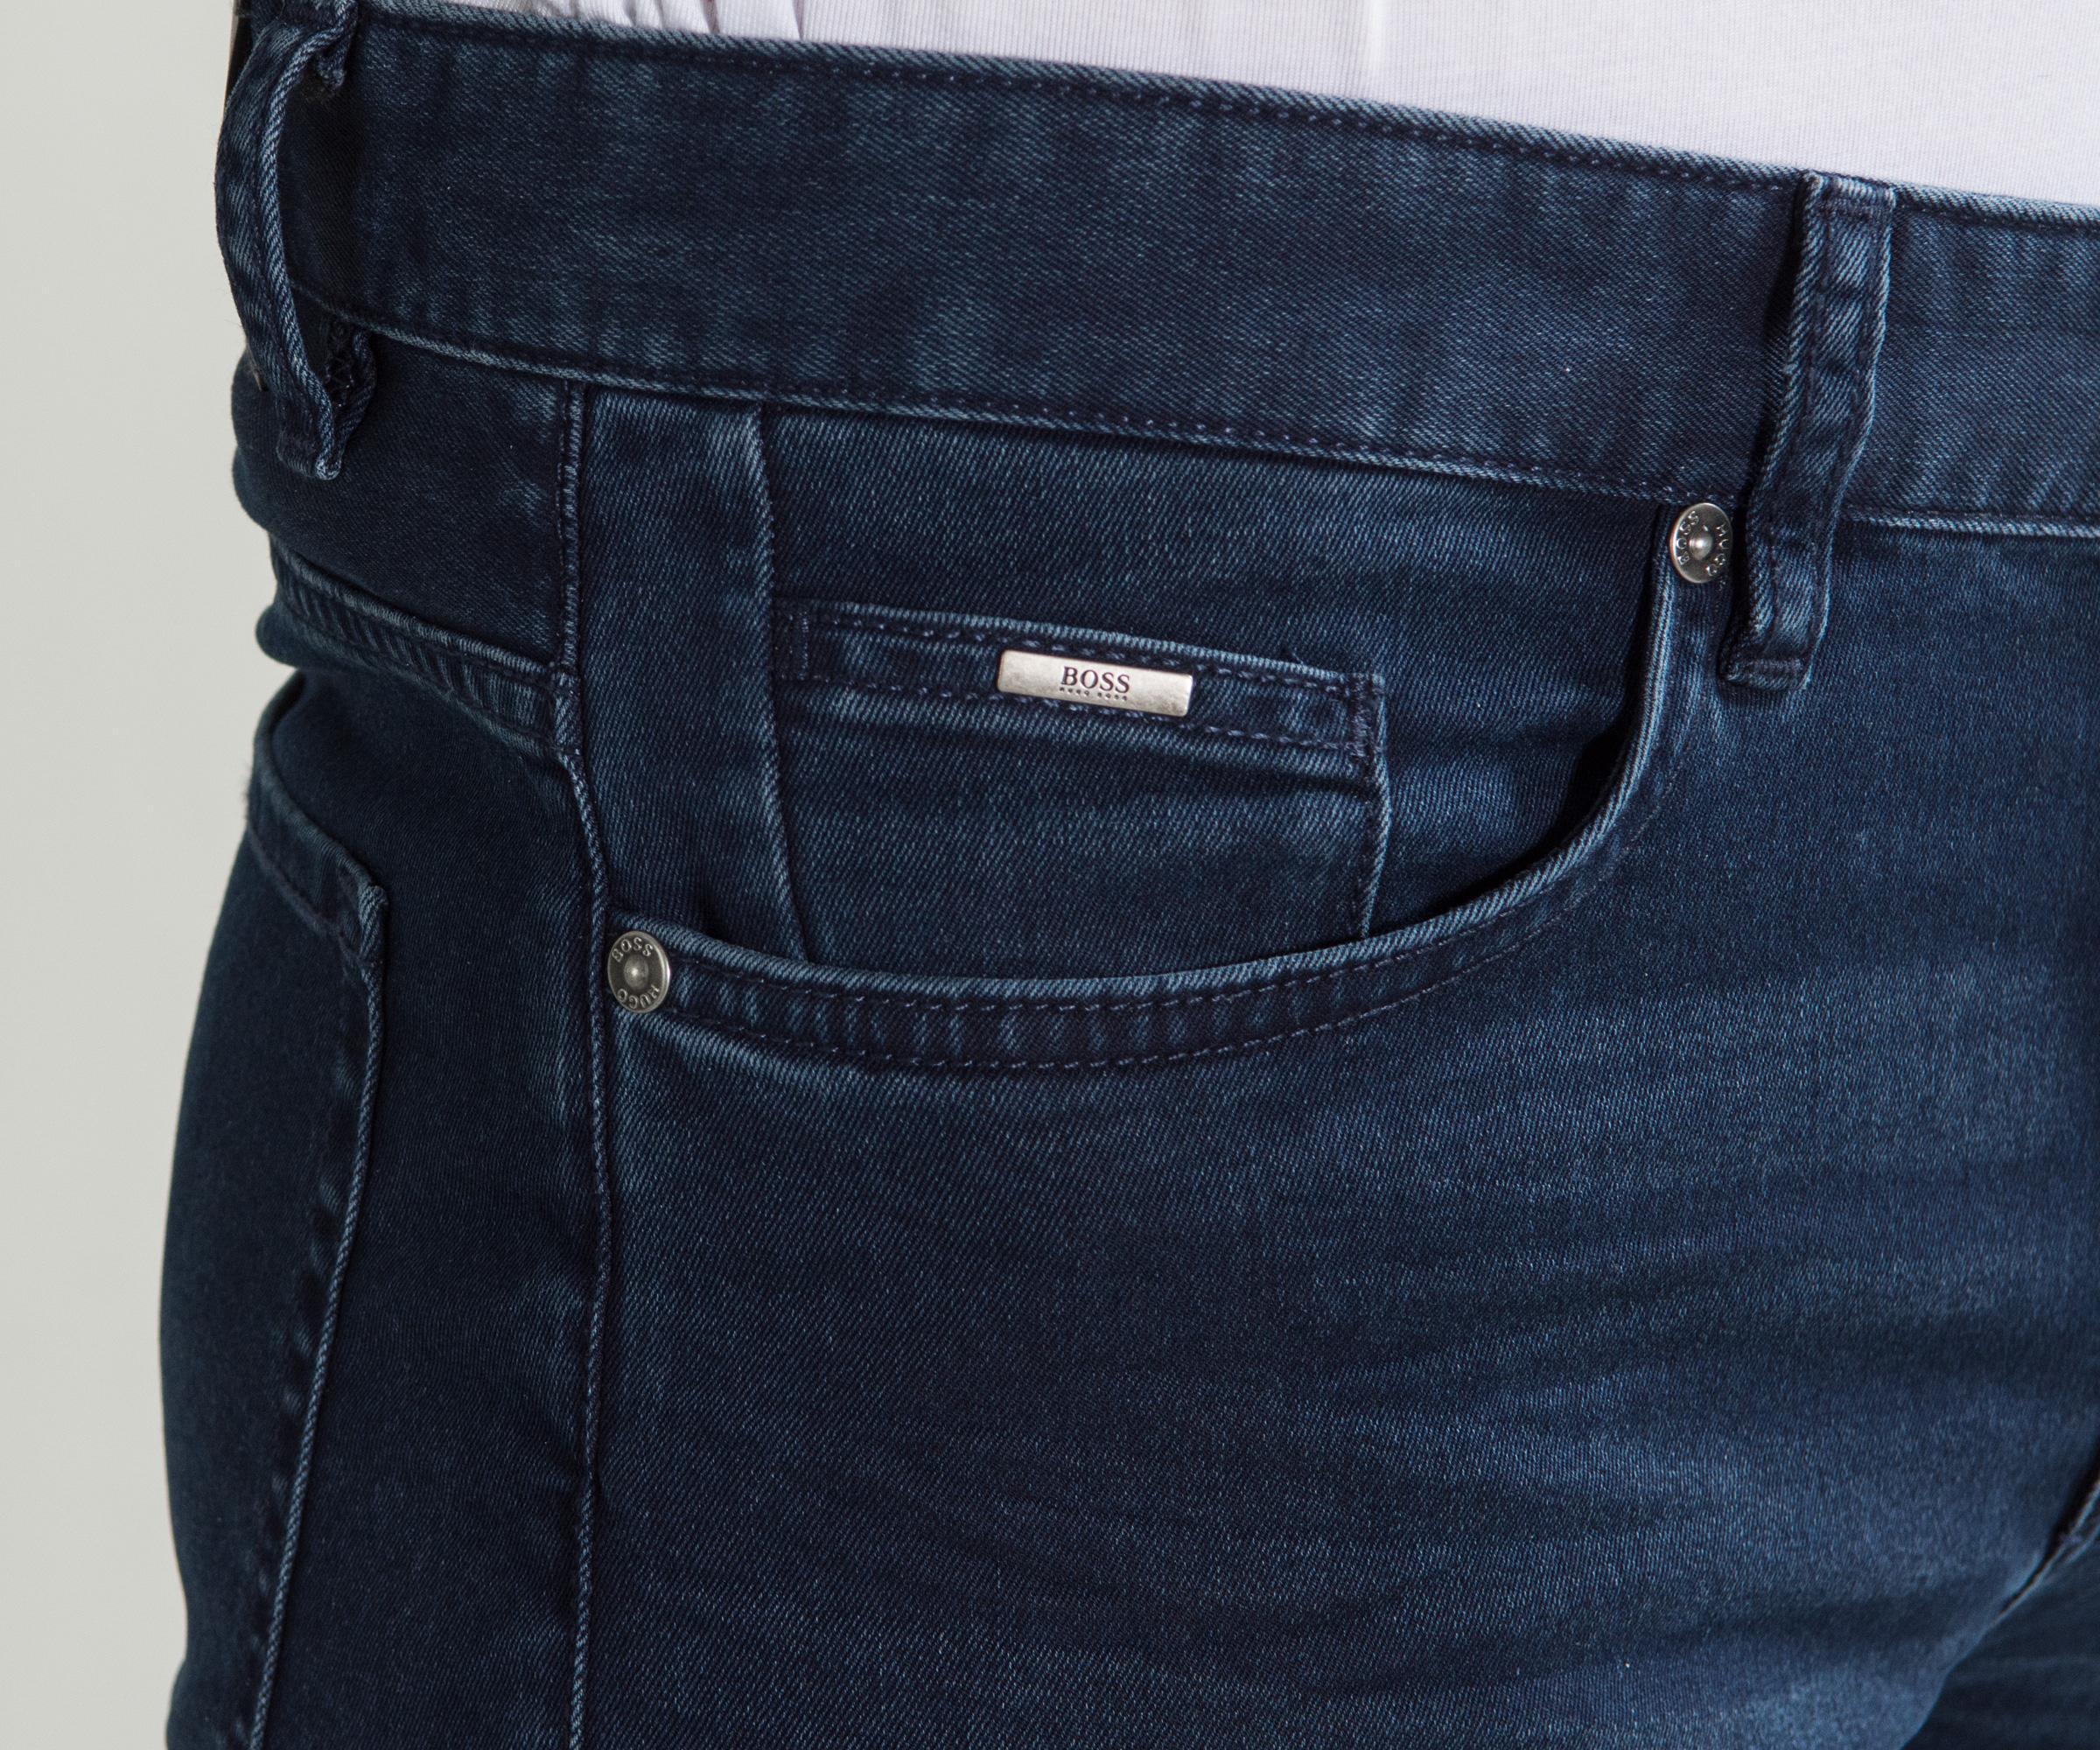 804b3d5564878 BOSS -  delaware  Slim Fit Jeans Dark Blue for Men - Lyst. View fullscreen